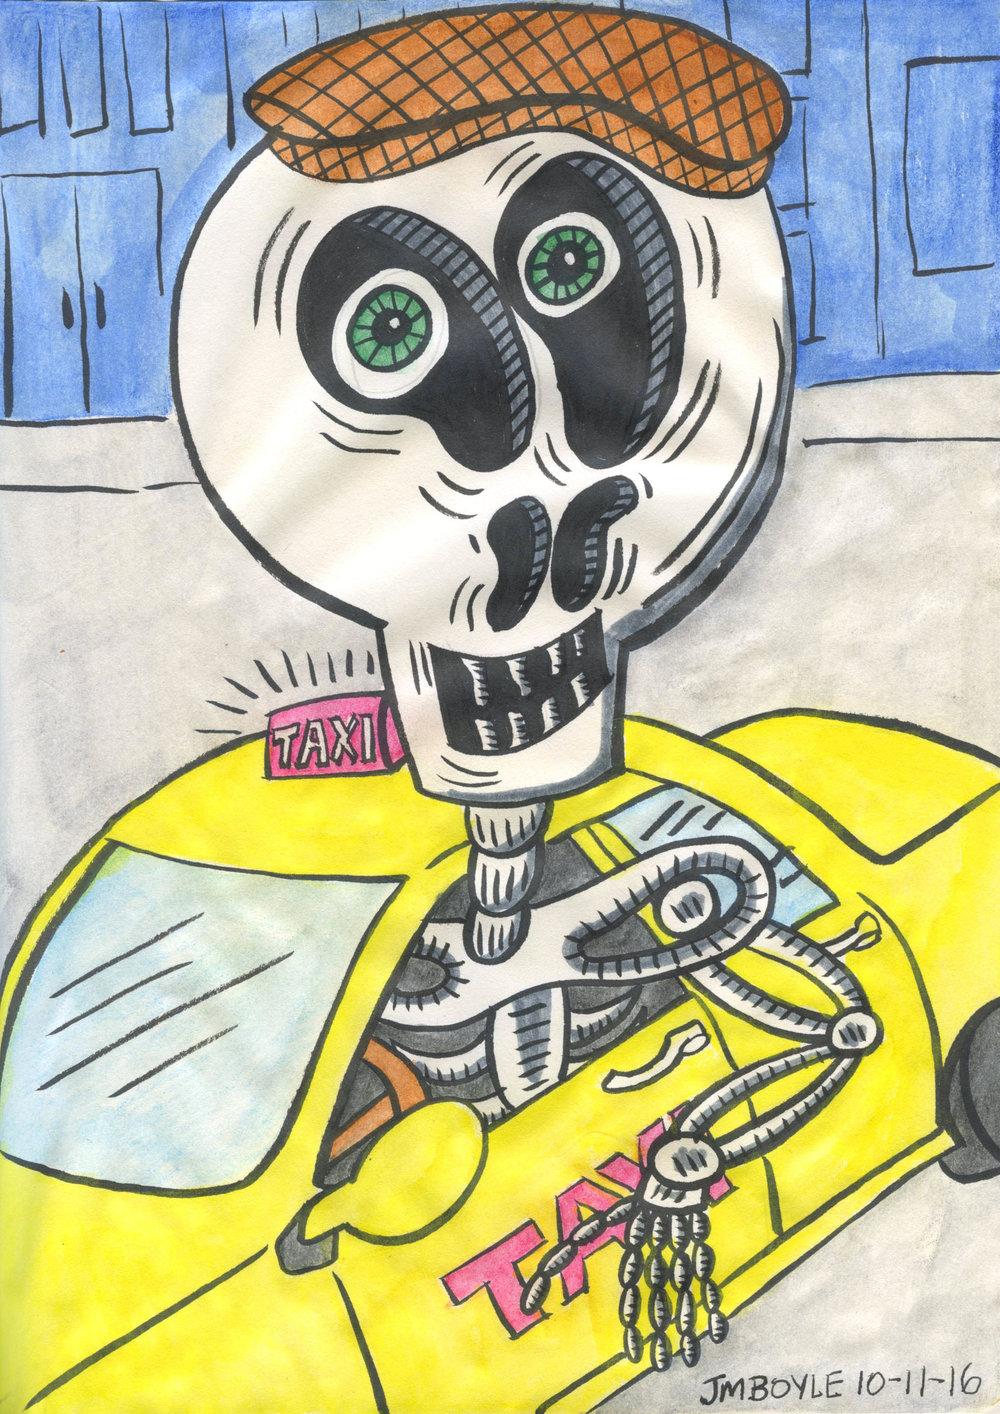 10-11-16_taxi_driver.jpg